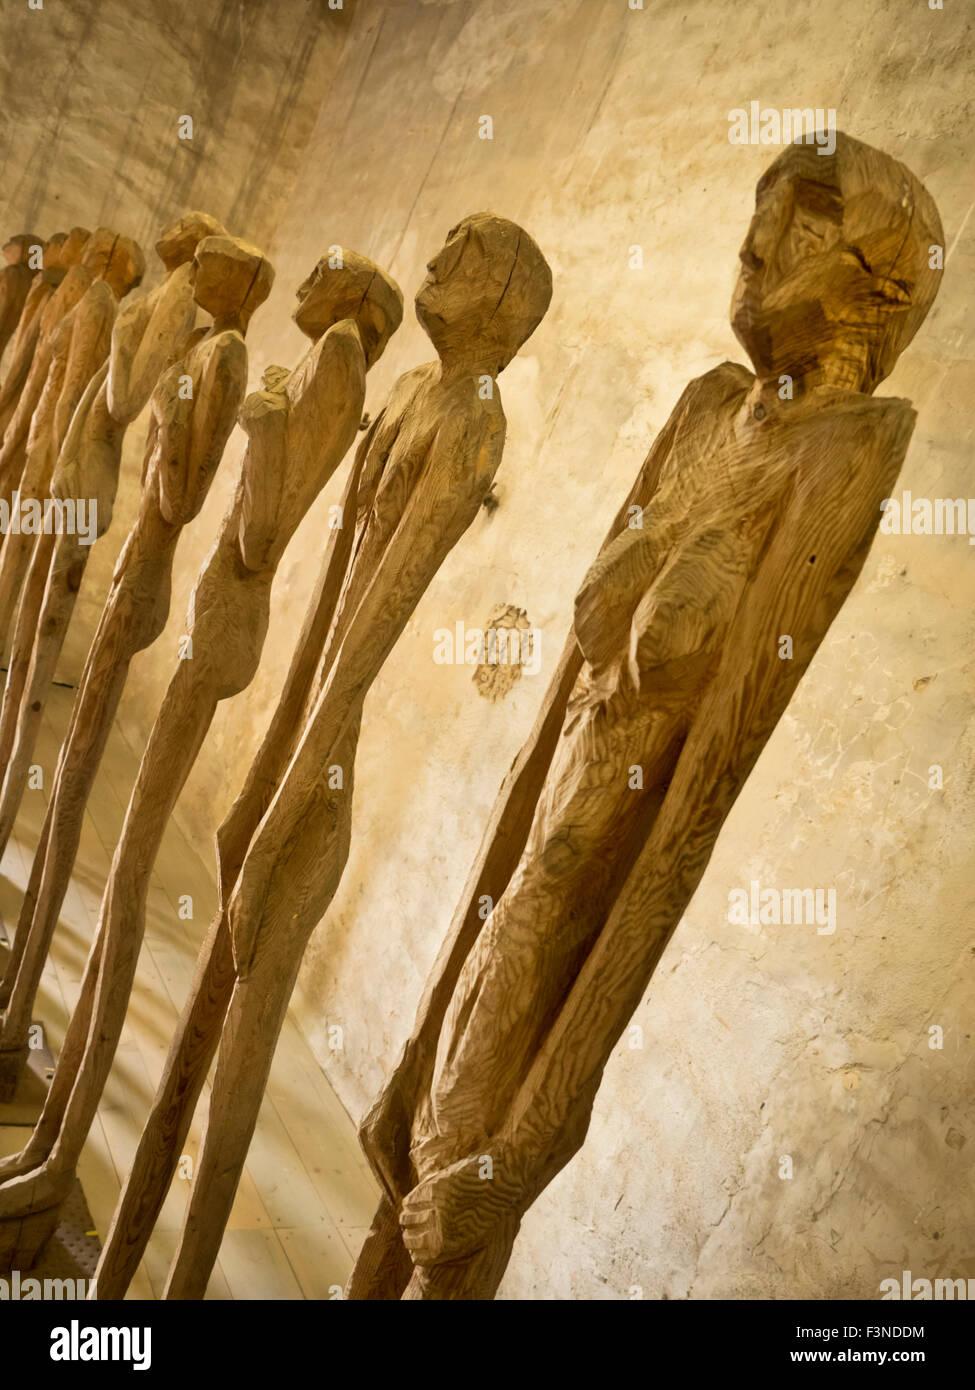 Holzfiguren im Kapitelturm in Tangermünde Stock Photo